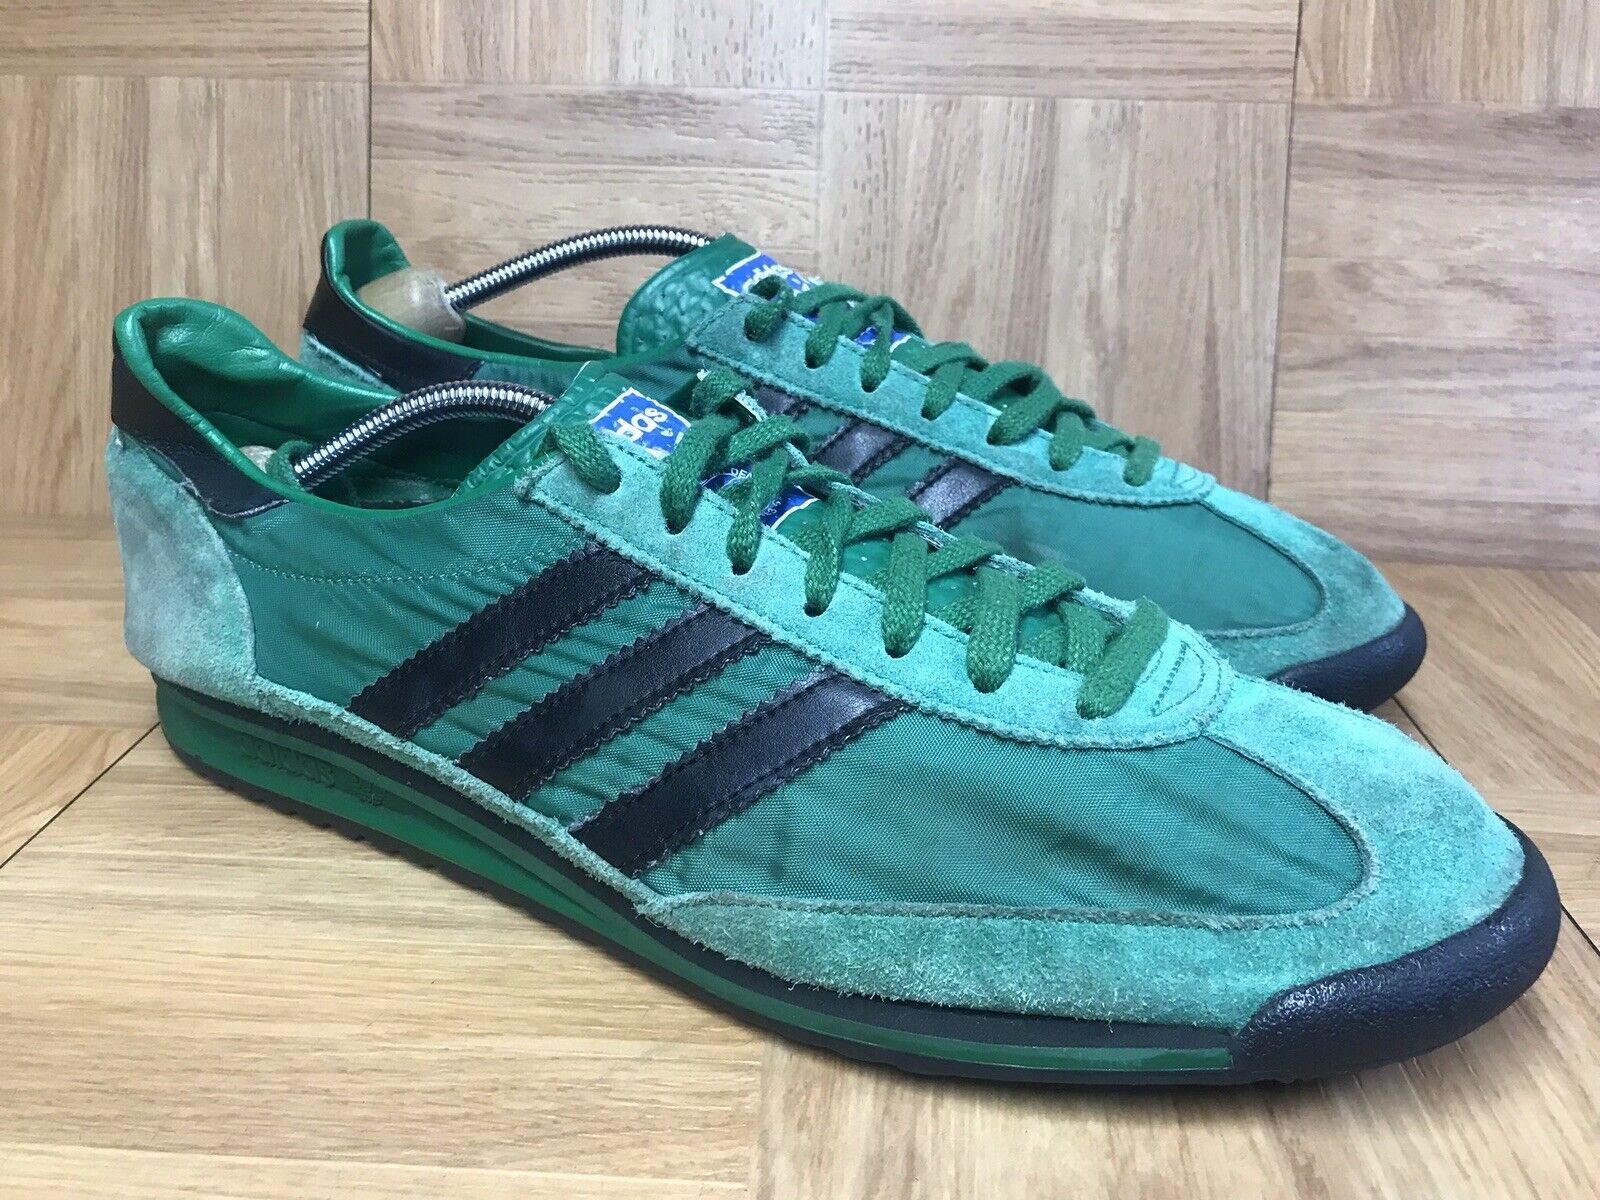 RARE Adidas Originals SL72 Vintage Green Retro Trainers Racers SZ 11 shoes